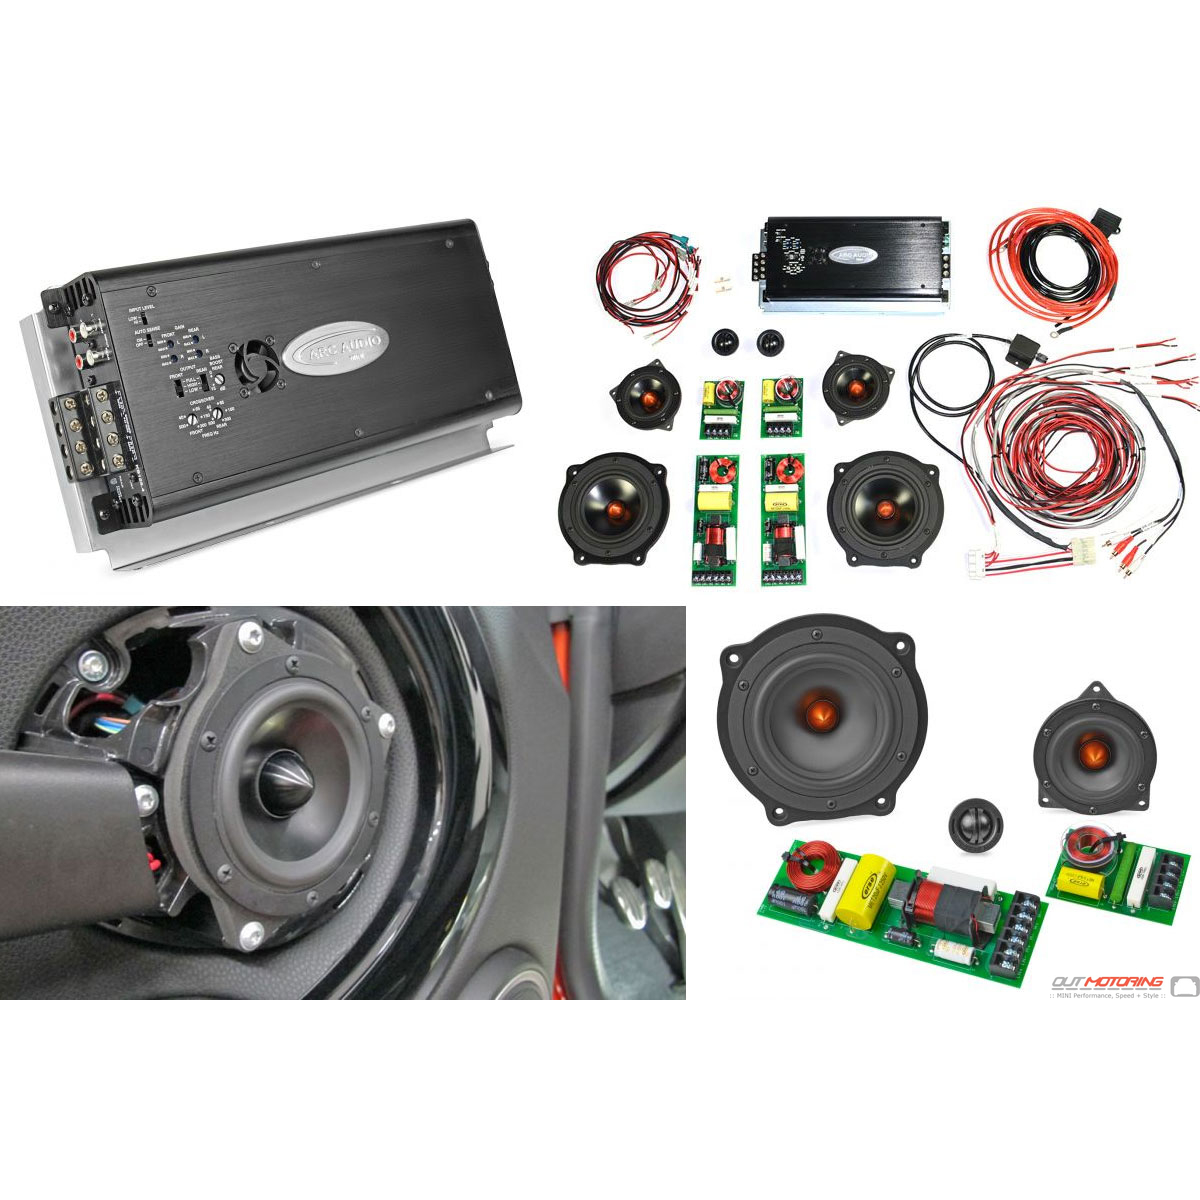 soundstage speaker kit mini cooper integral audio mini. Black Bedroom Furniture Sets. Home Design Ideas